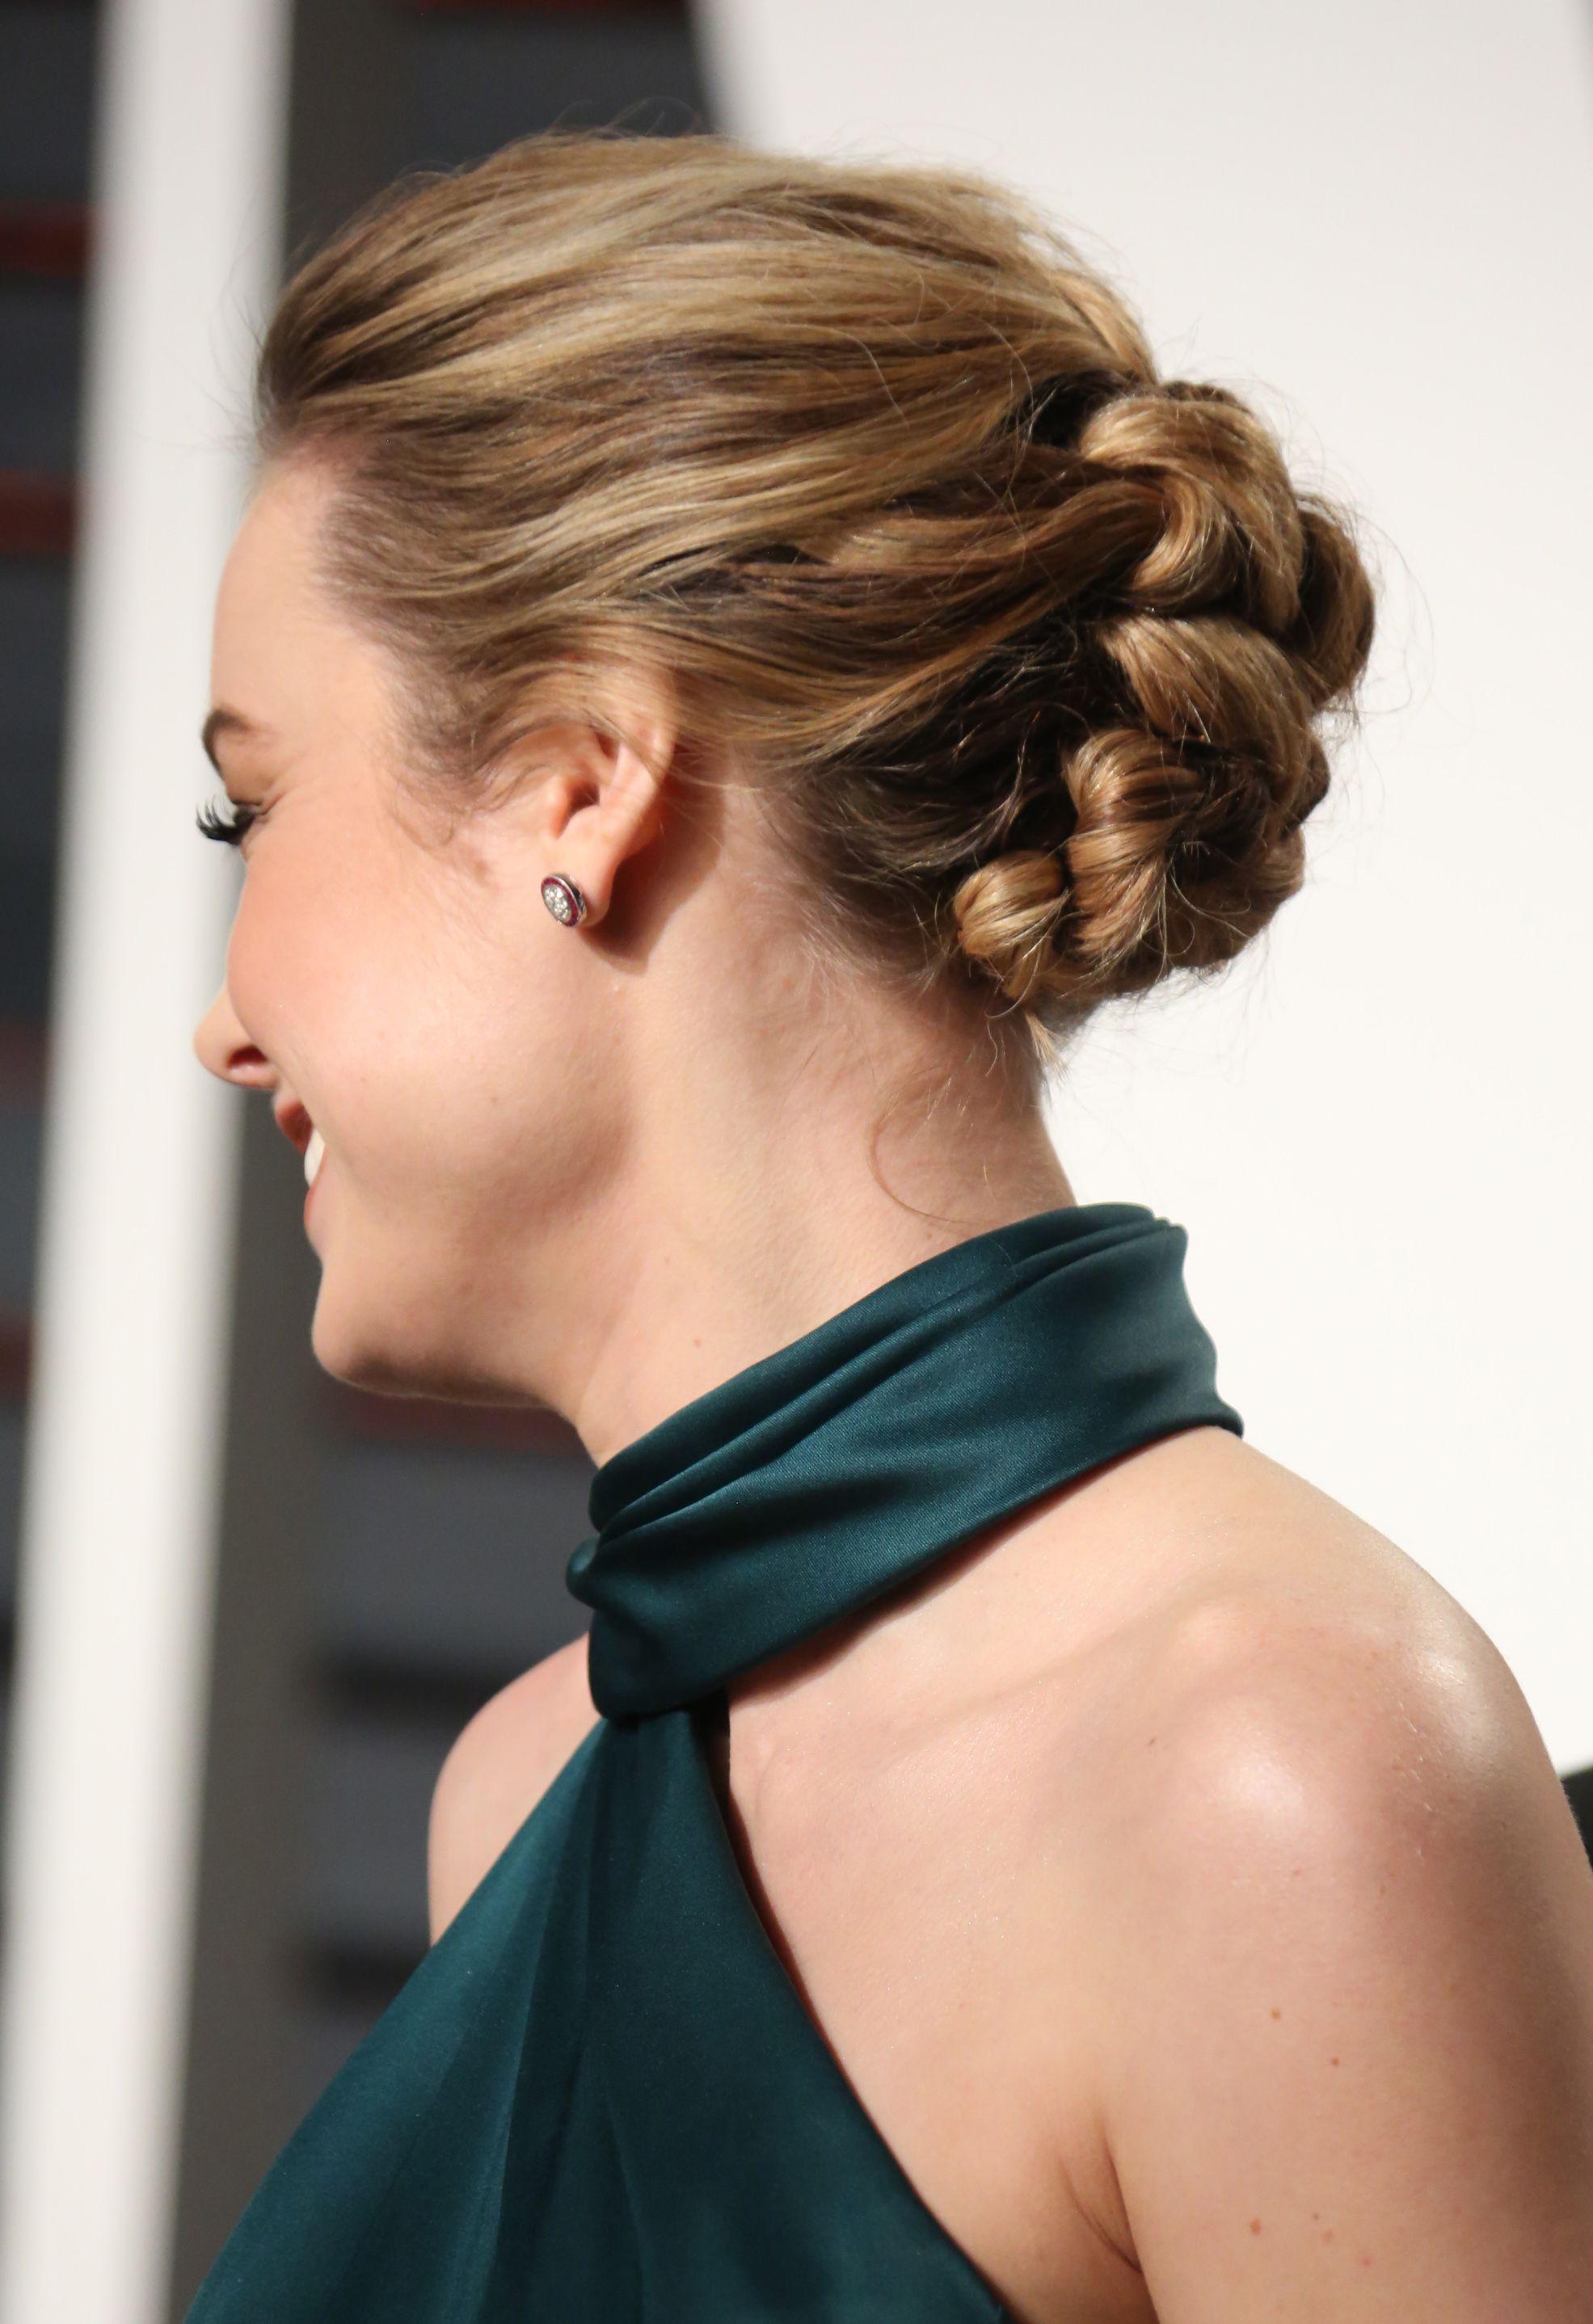 34 braid styles we love - best hair plaits for long hair